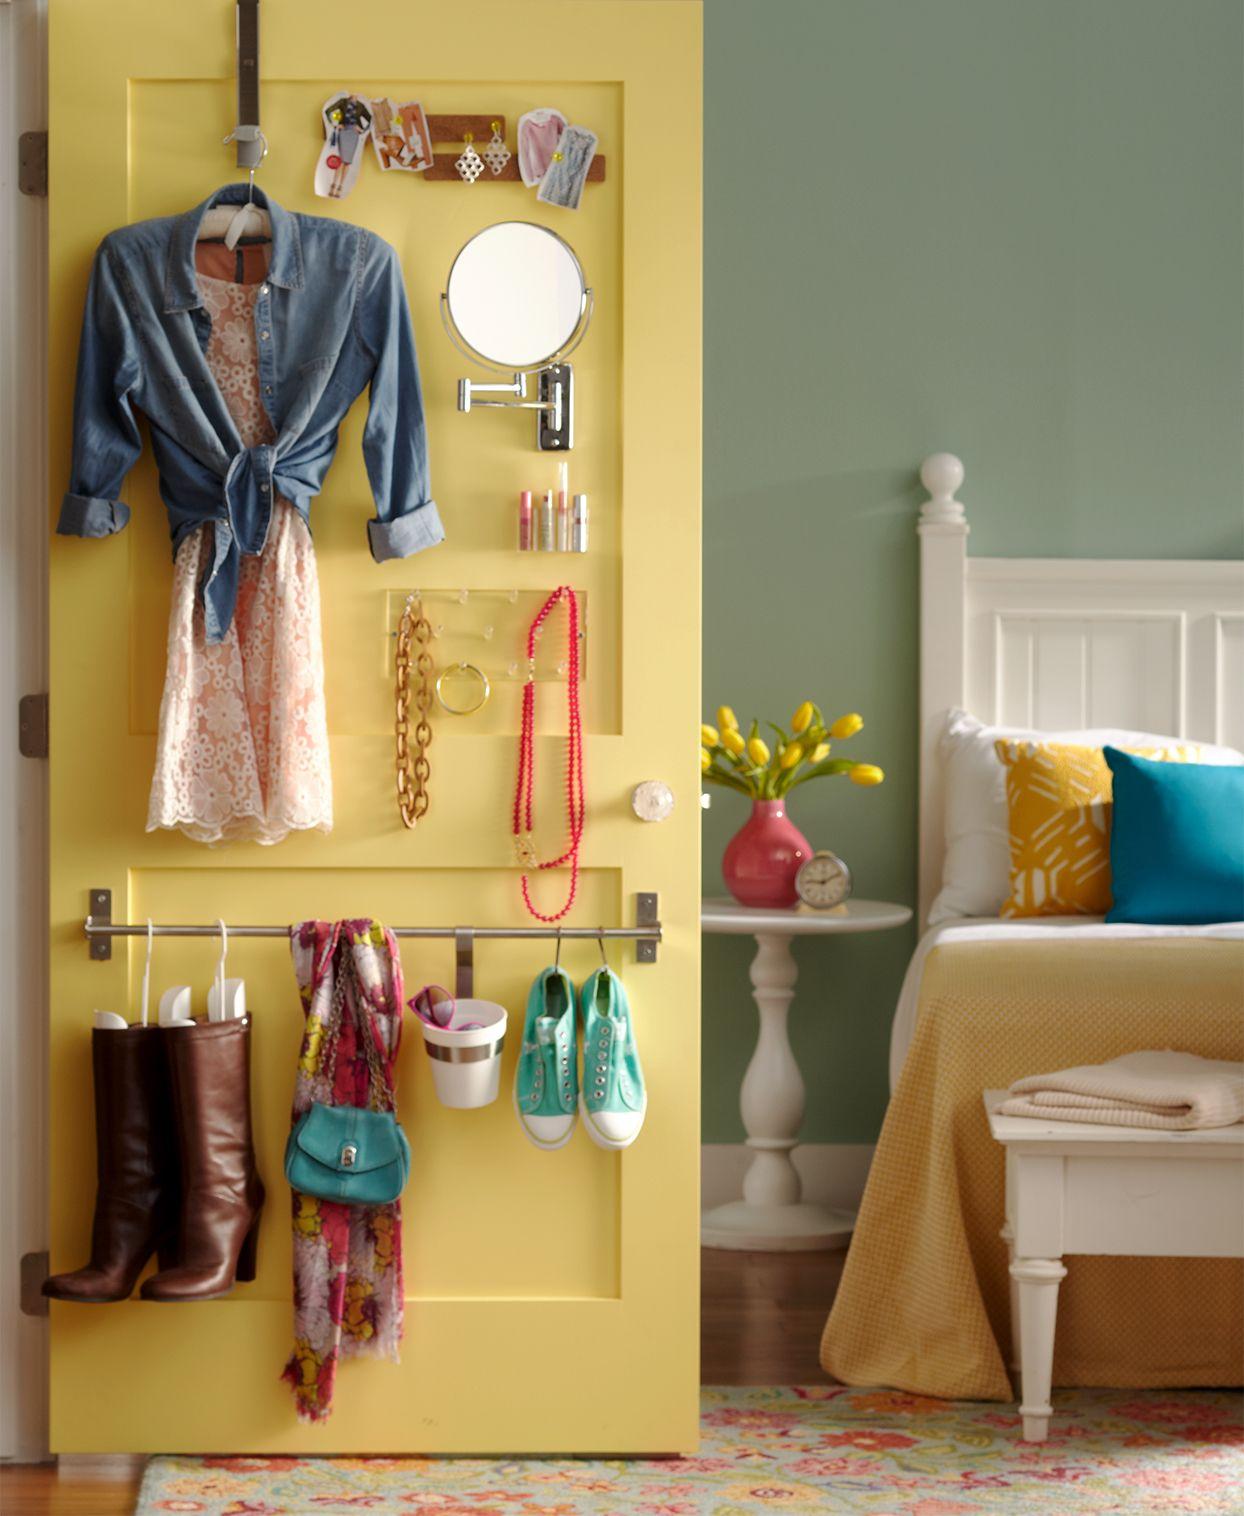 Store More With These Behind The Door Storage Ideas In 2020 Organization Bedroom Small Bedroom Diy Storage Hacks Bedroom